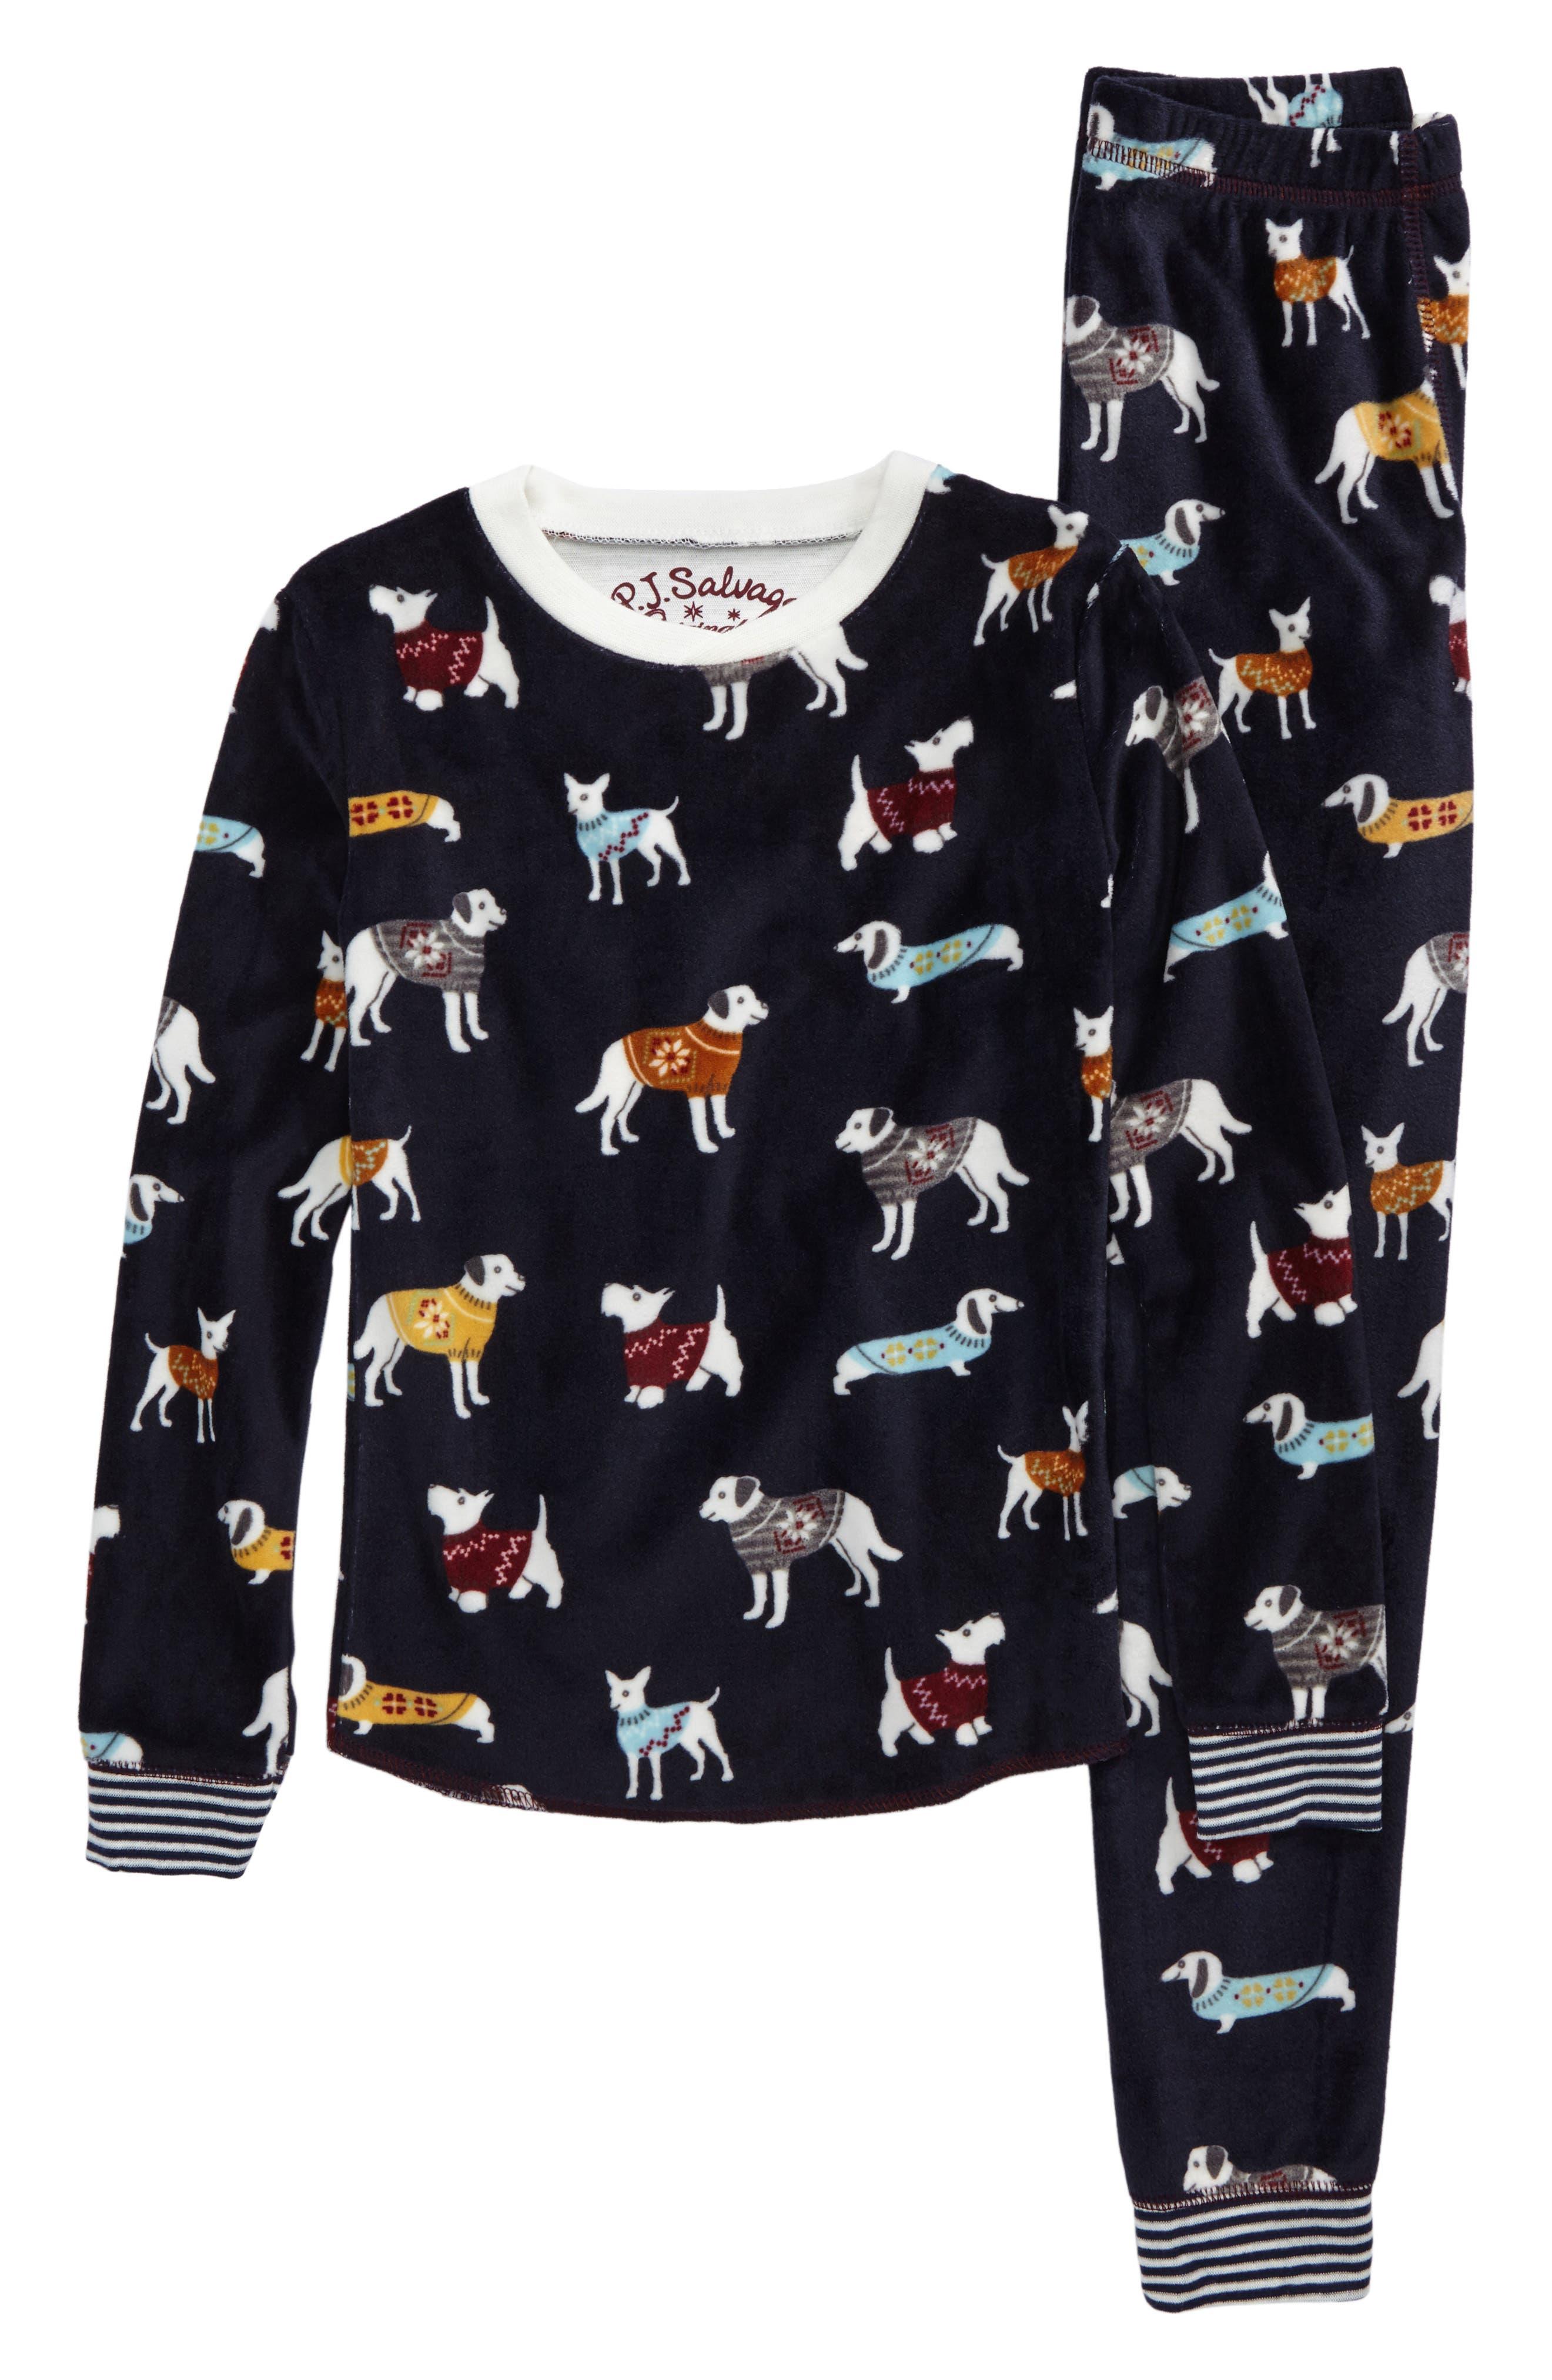 Alternate Image 1 Selected - PJ Salvage Fitted Print Fleece Two-Piece Pajamas (Toddler Girls, Little Girls & Big Girls)